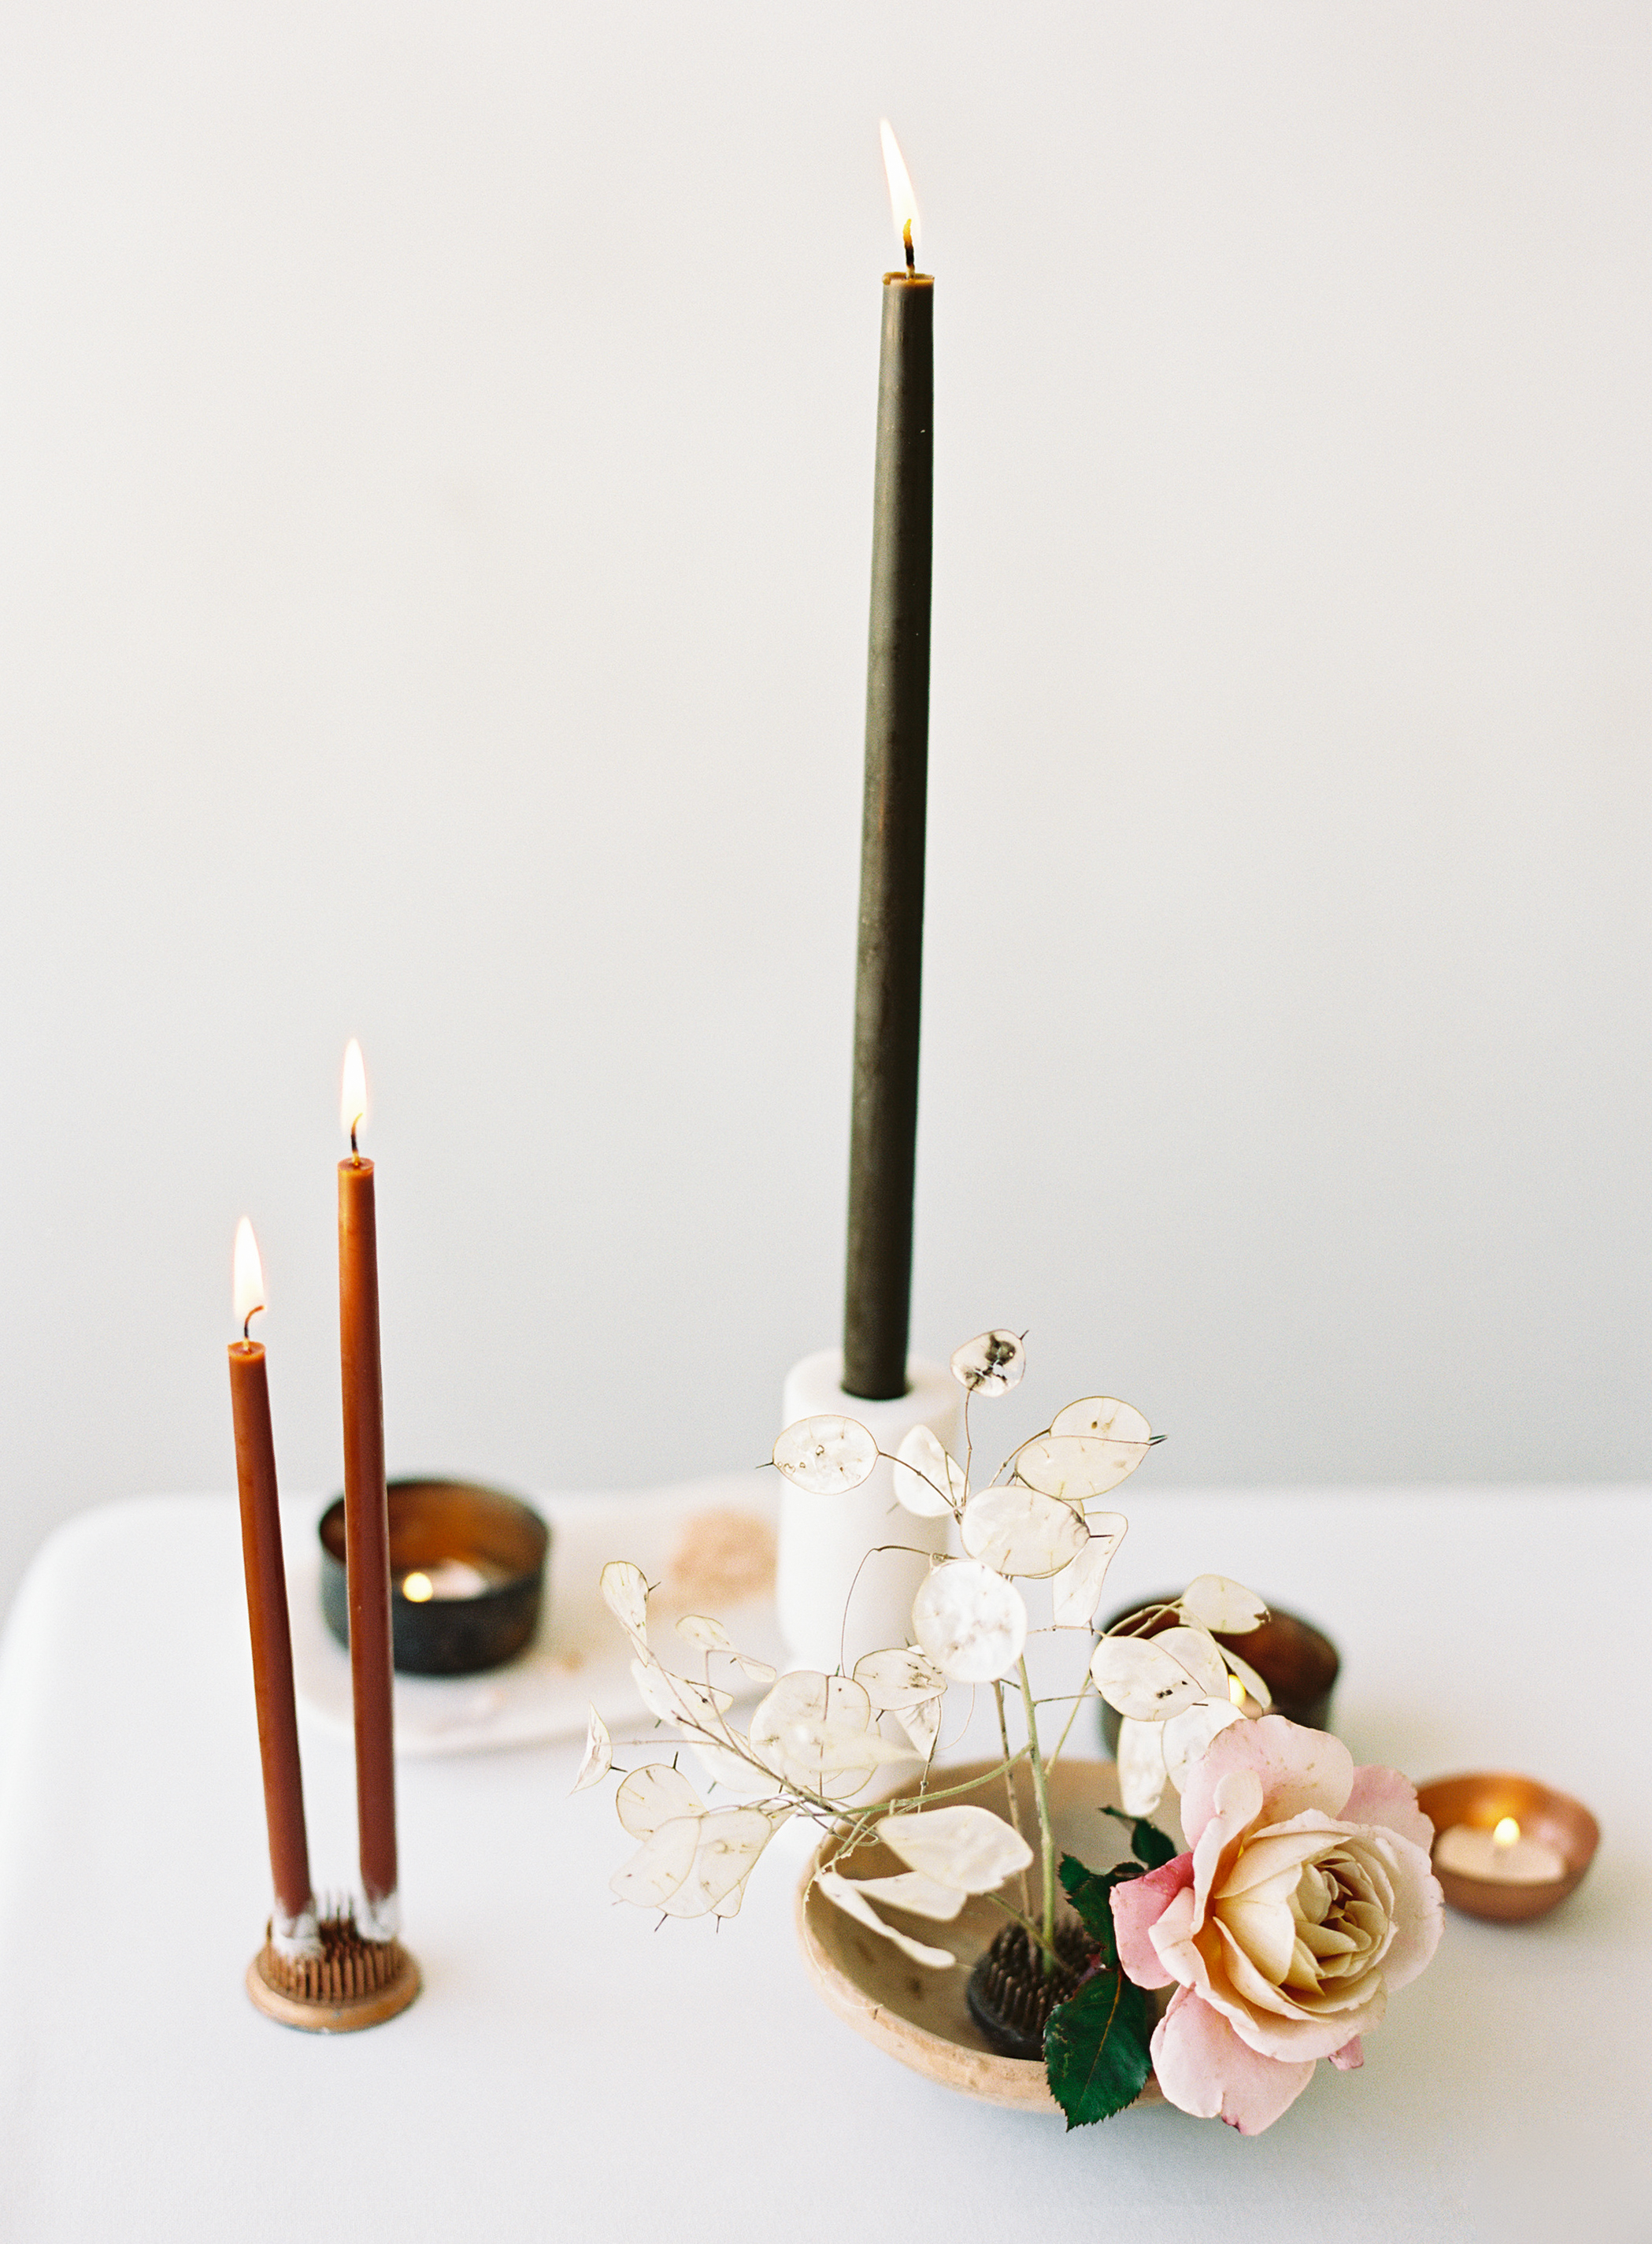 Sentient Floral Workshop-Carrie King Photographer-005.jpg